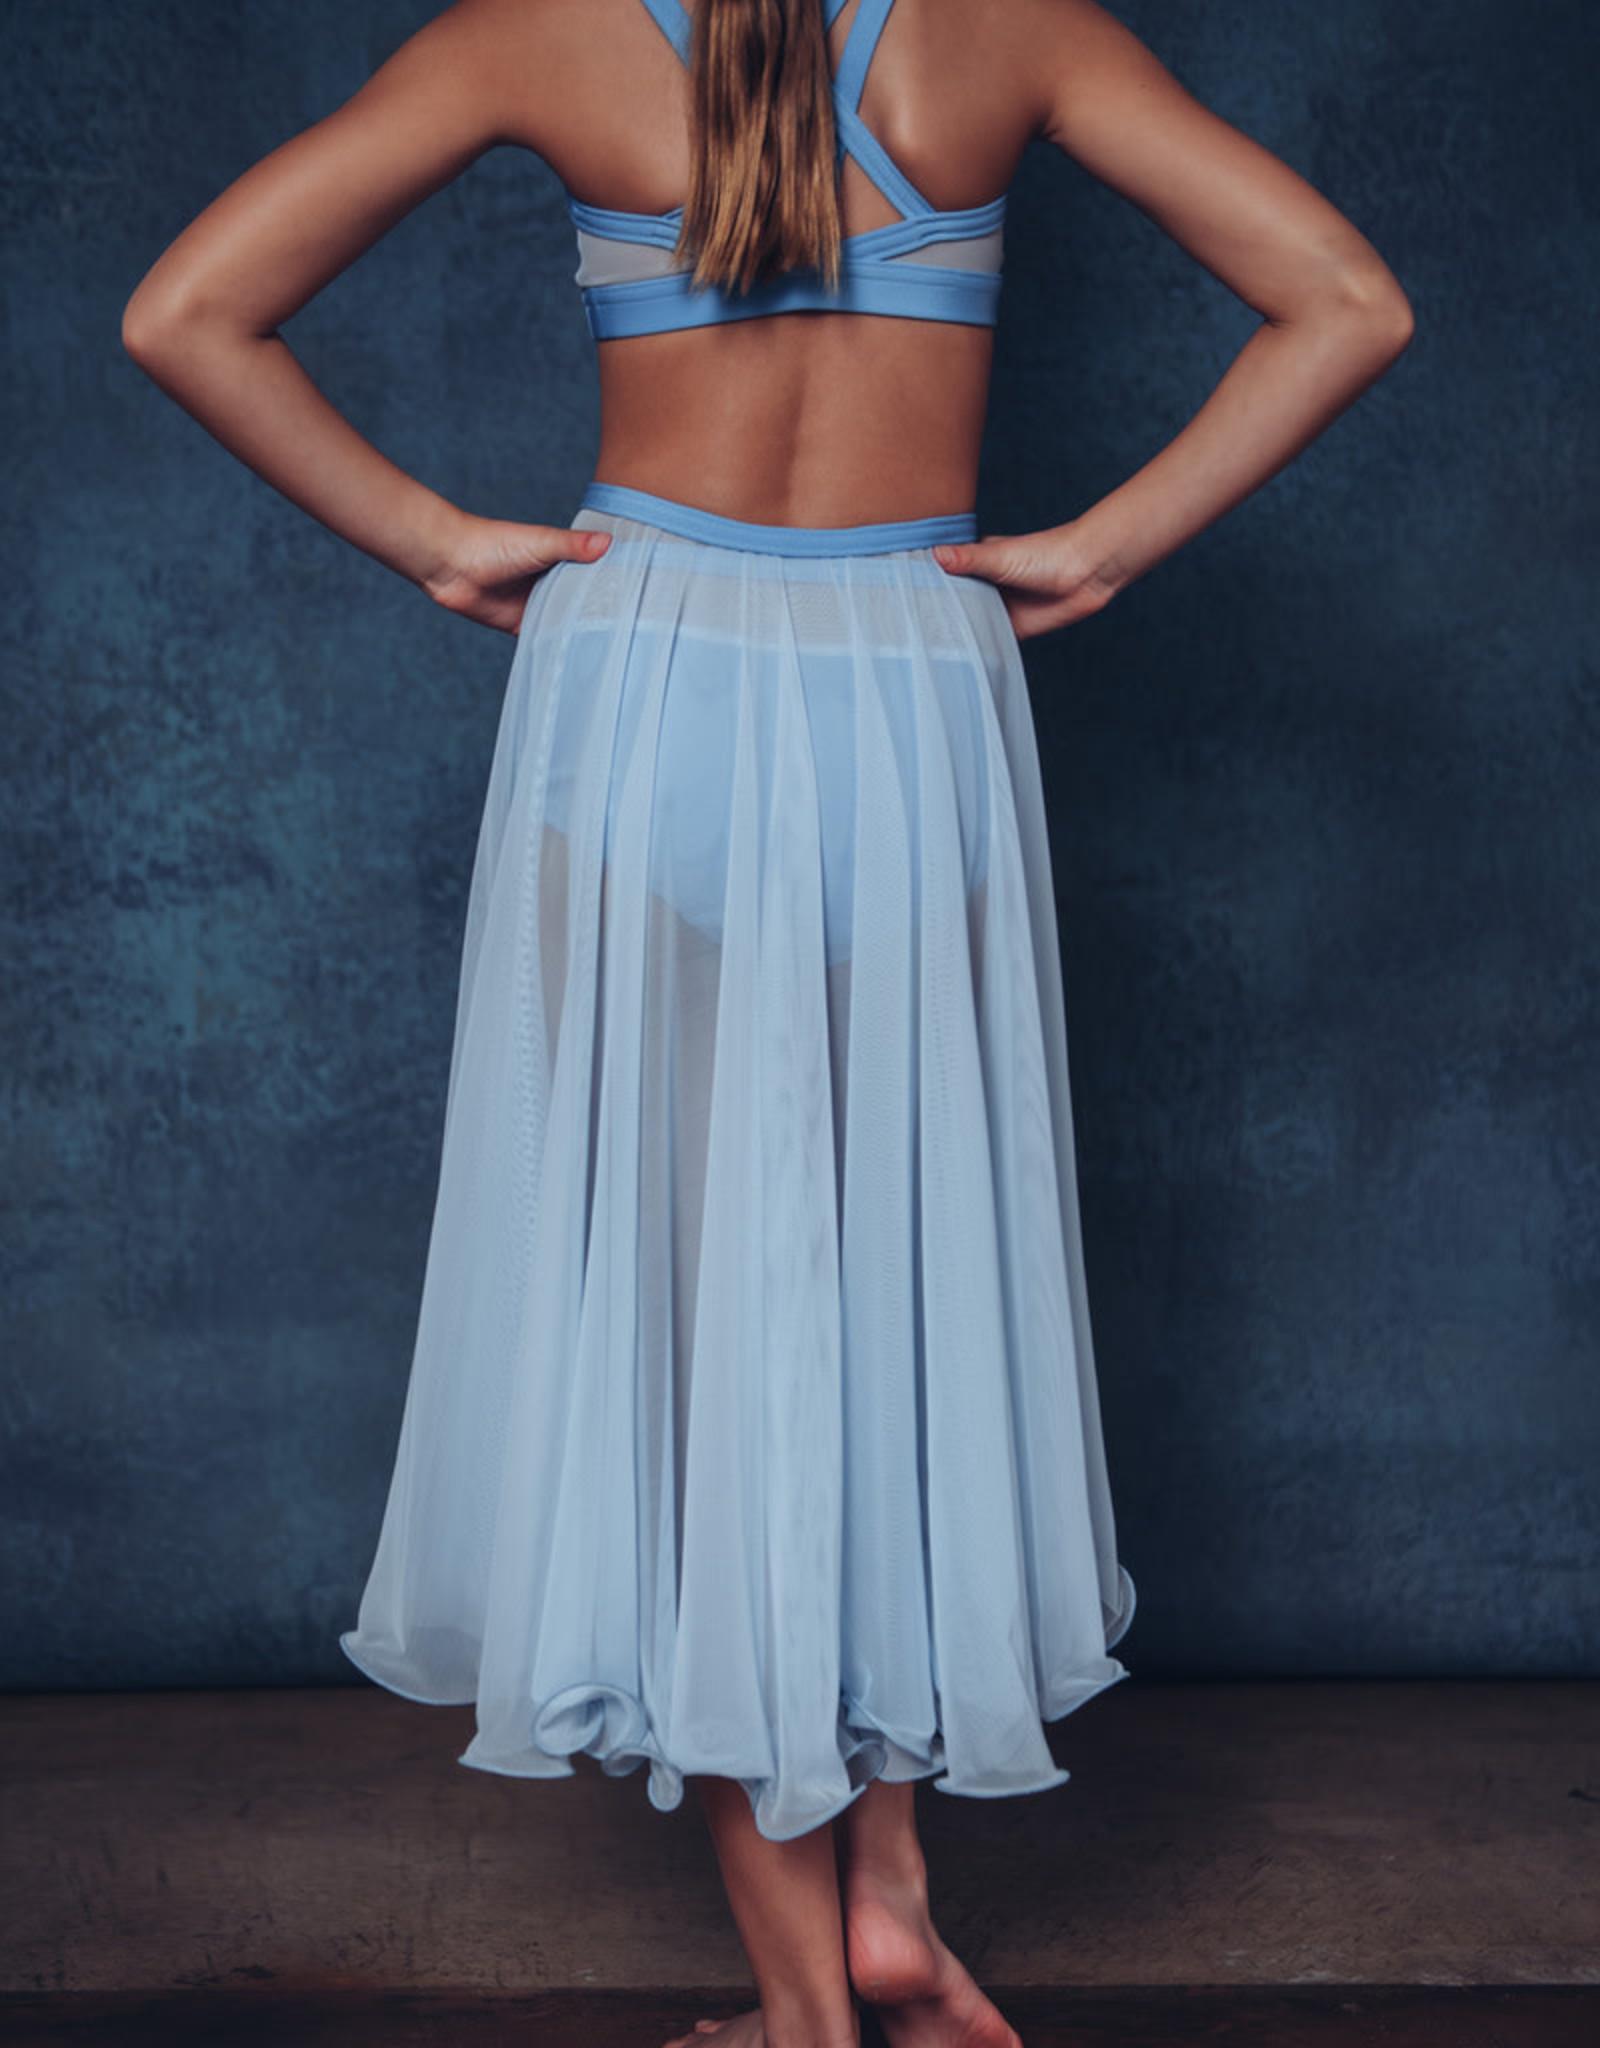 Details Dancewear Details Convention Top & Bottom Sets